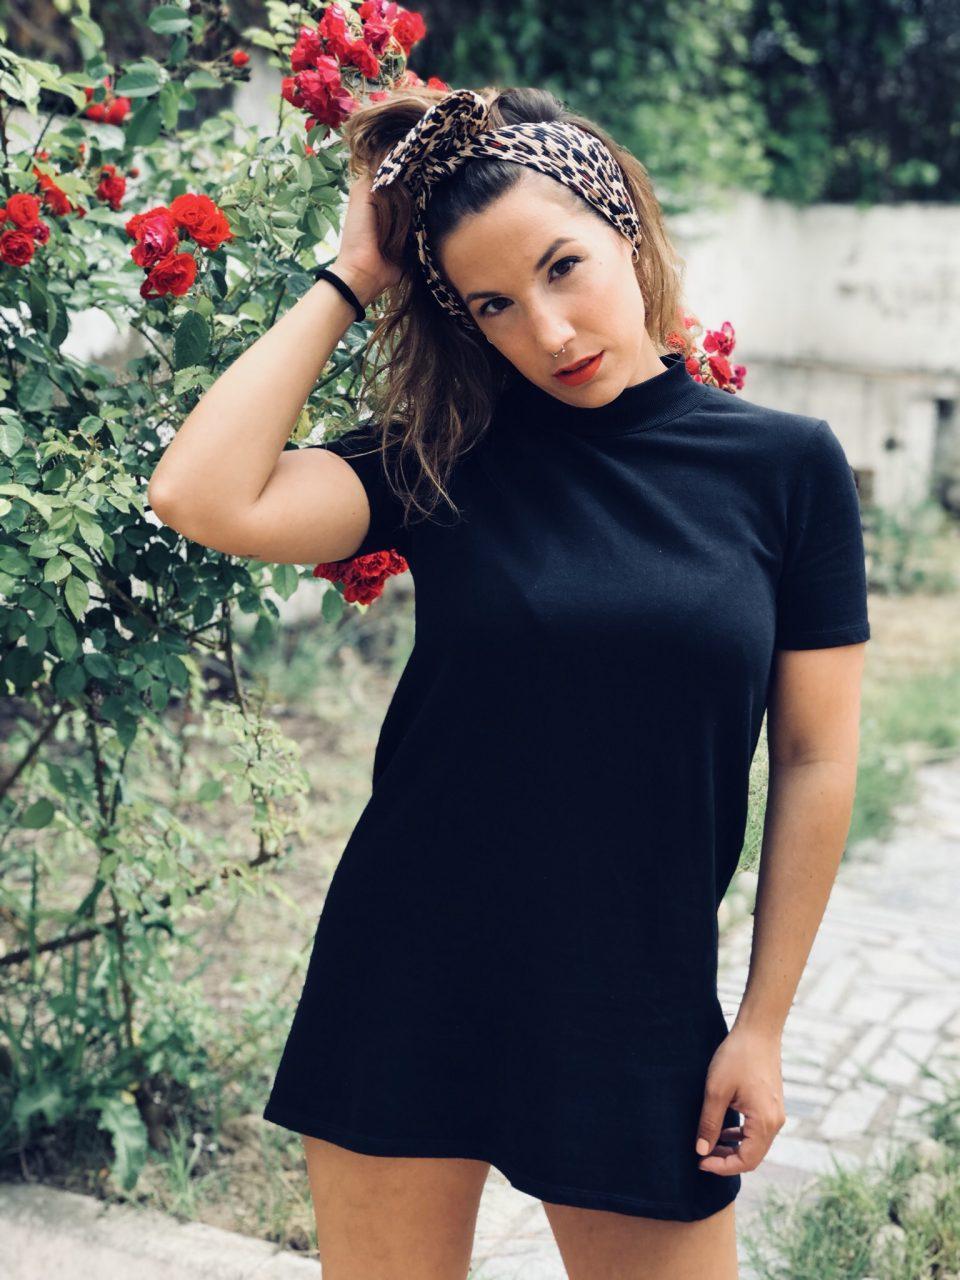 María Barco Rodríguez